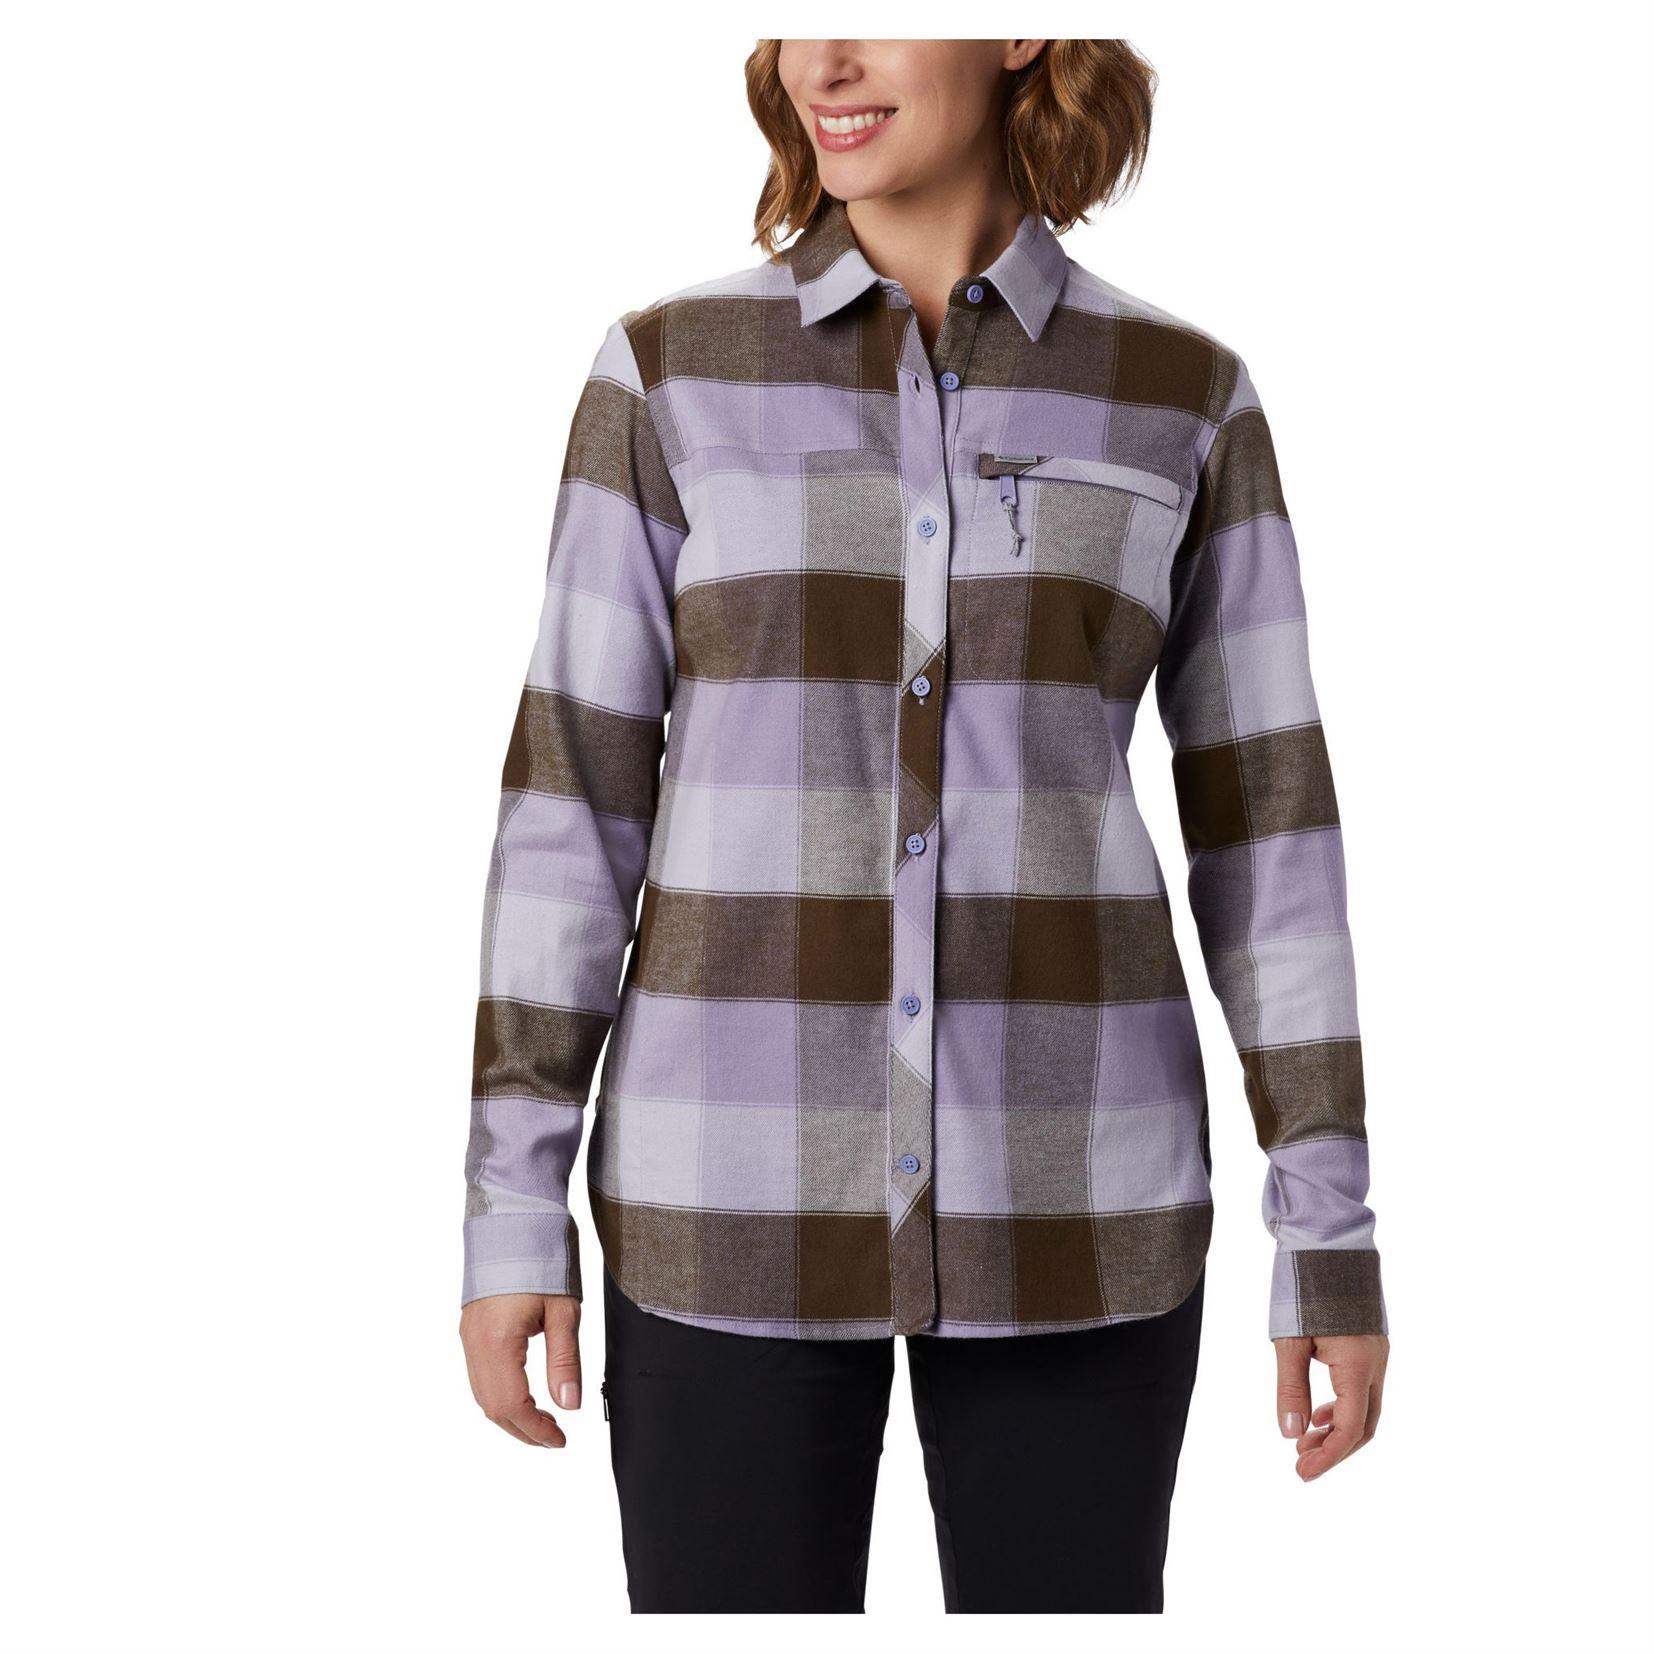 Anytime II Stretch Shirt Long Sleeve - Women's